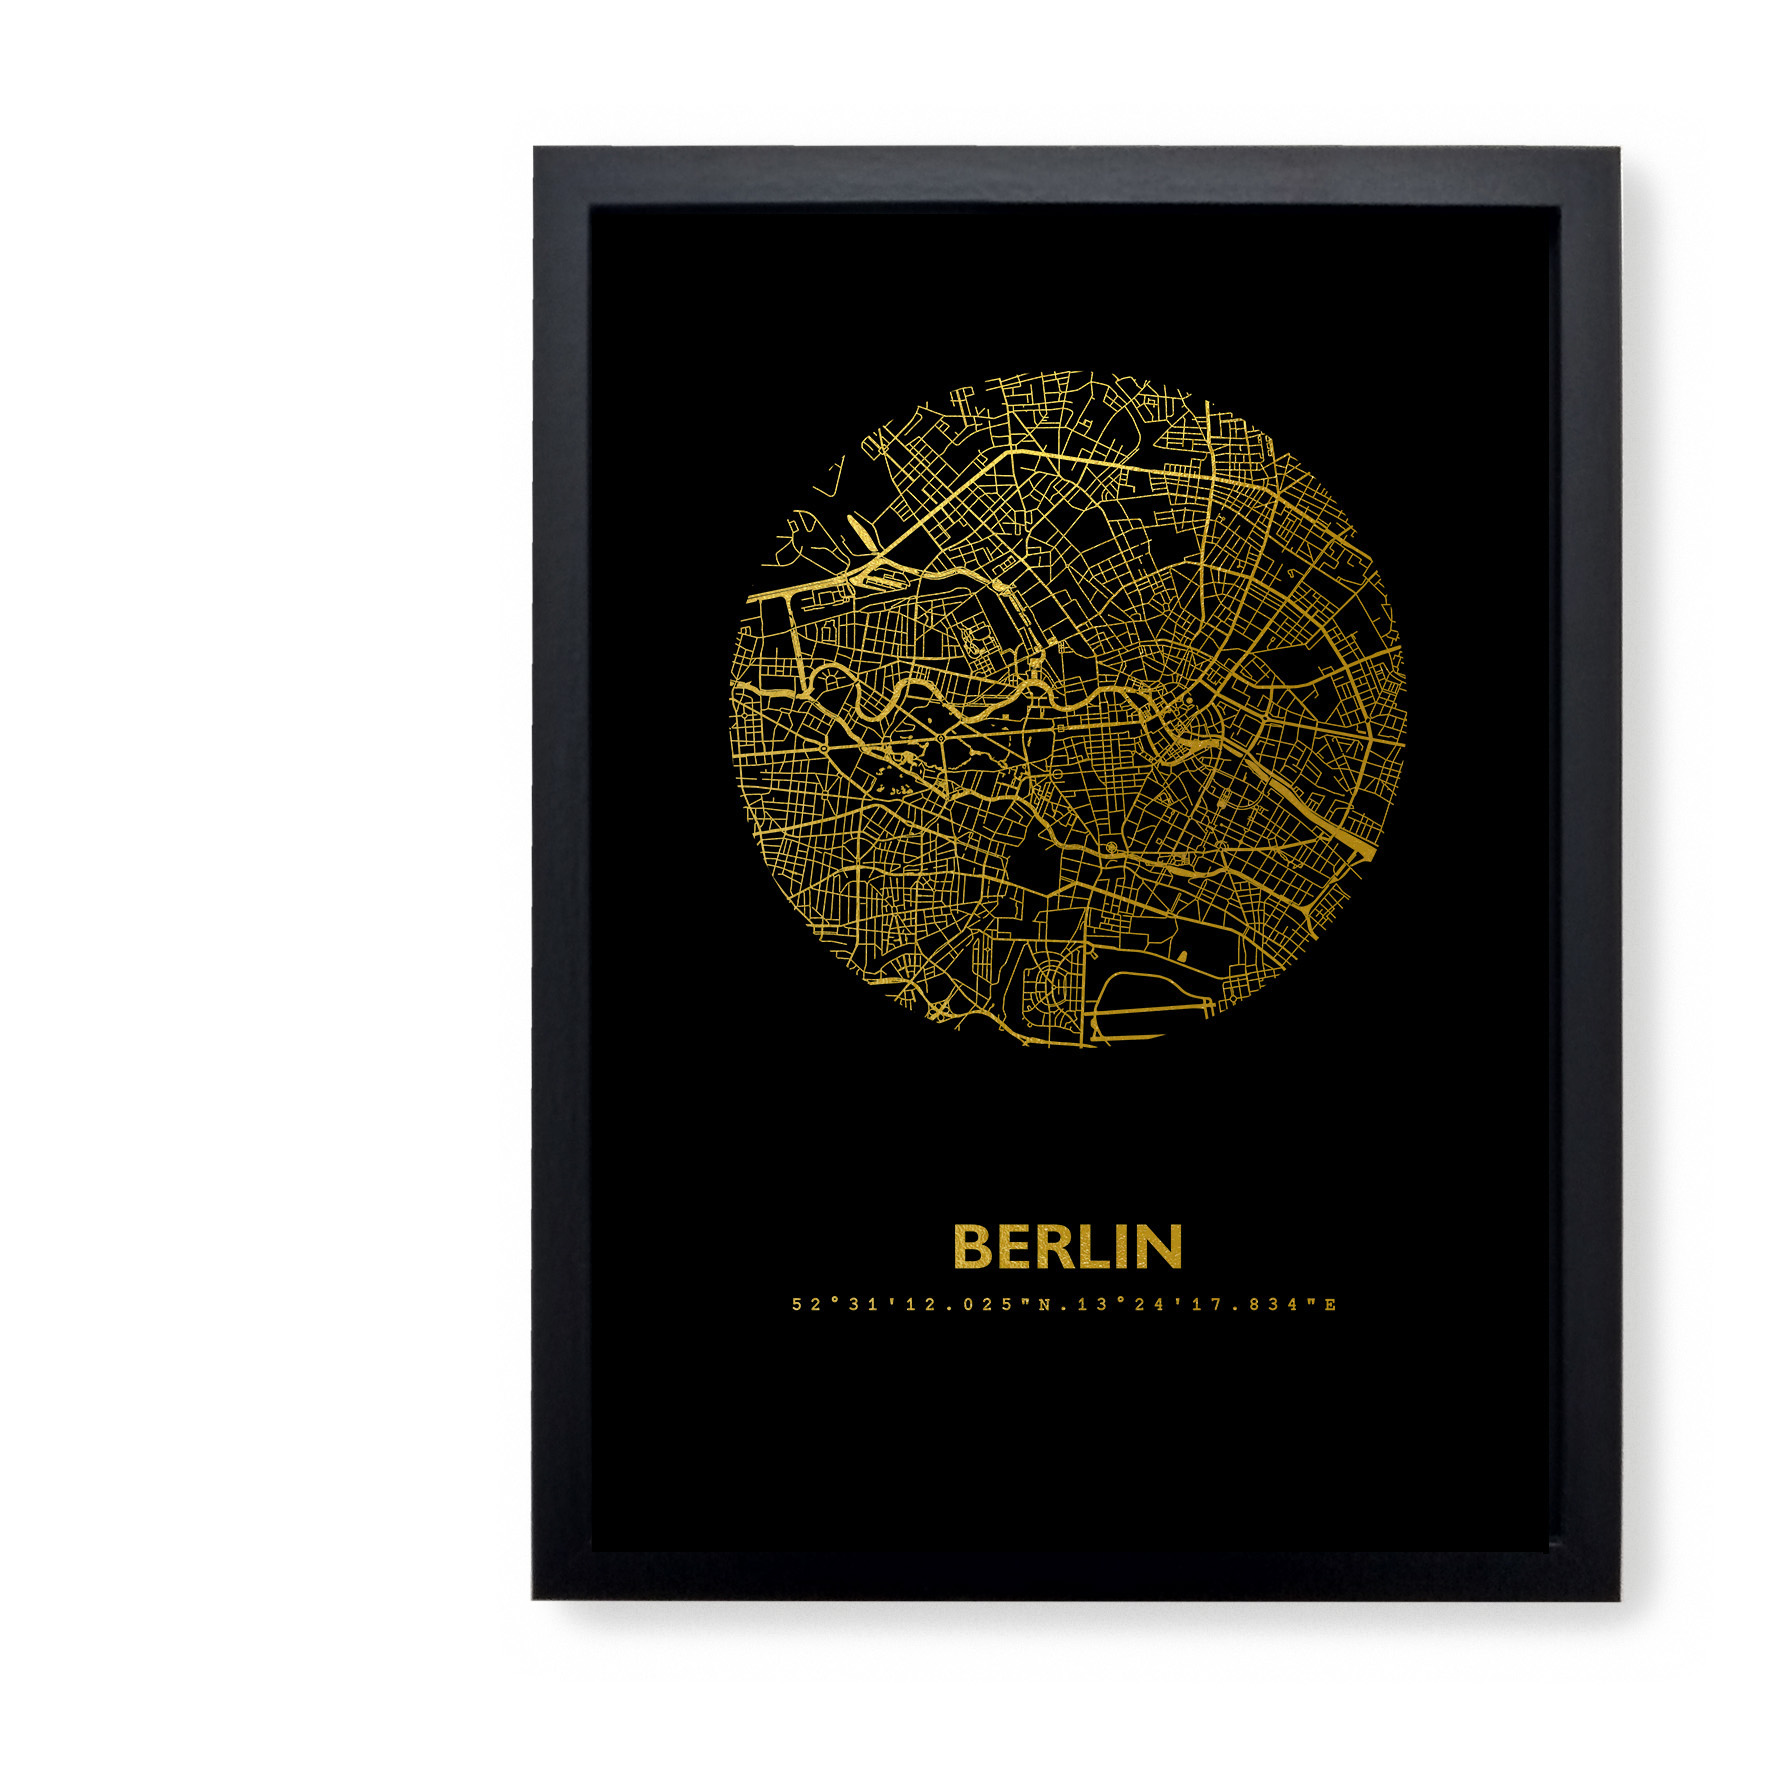 Inspiration von Berlinger Designstudio 44spaces